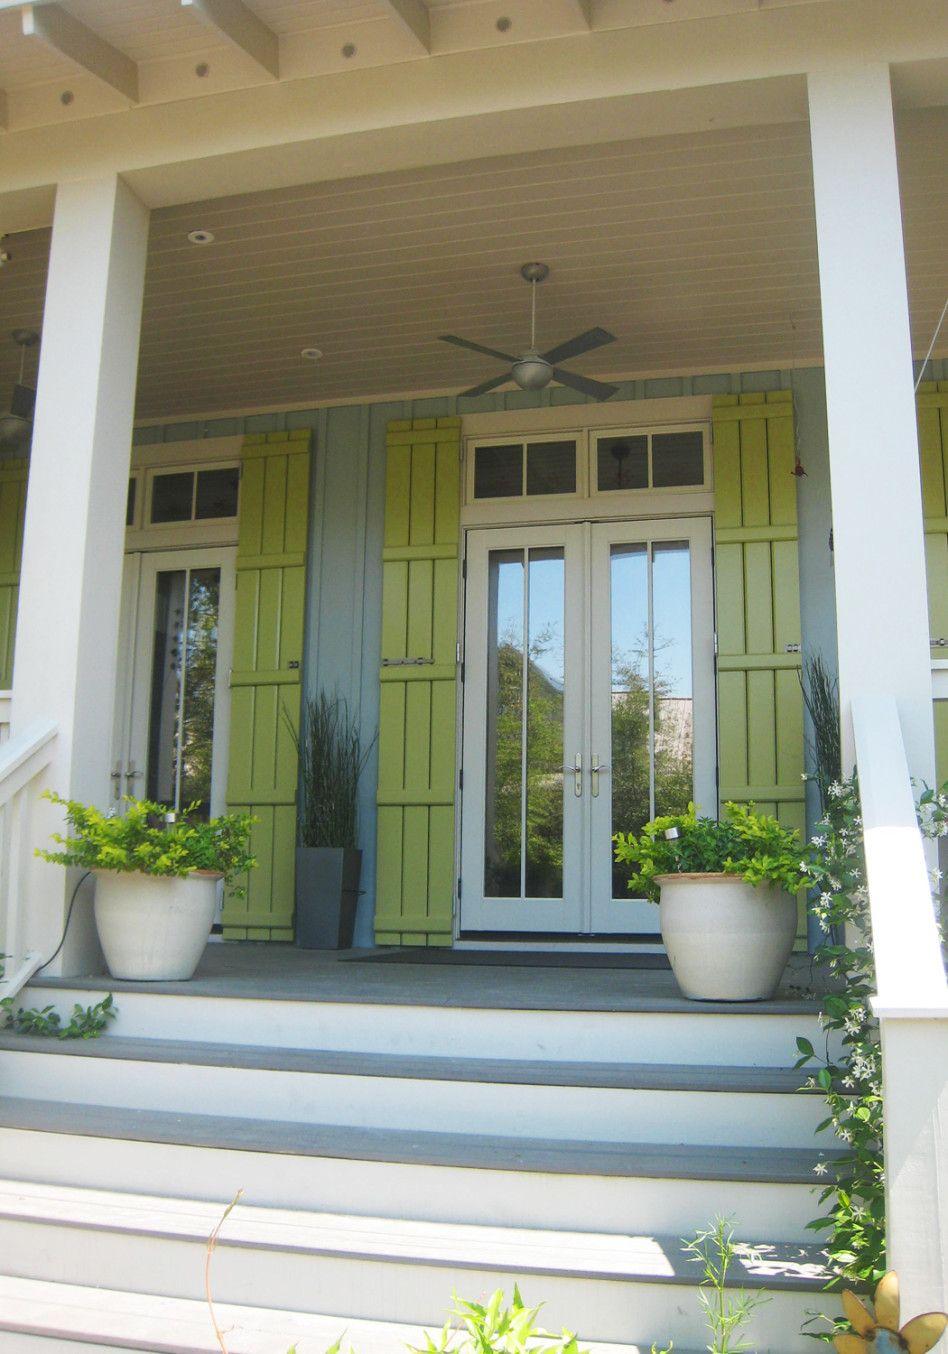 Exterior Fabulous Front Porch Decoration Using Light Blue Front Porch Wall Paint Including Square Casa De Playa Exterior Exteriores Caseros Persianas Verdes